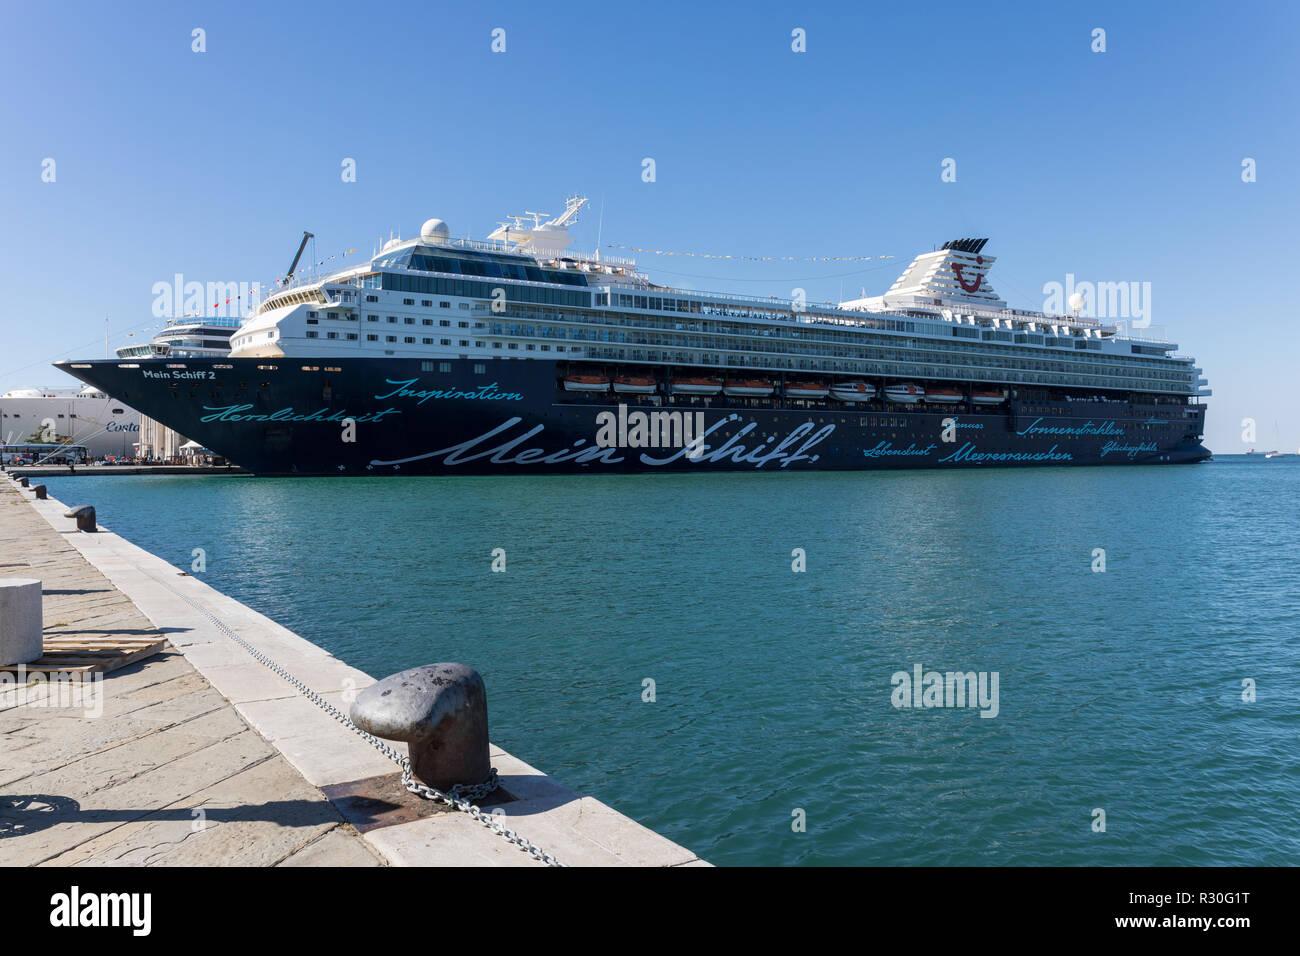 Luxury cruise ship Mein Schiff 2 docked in the port of Trieste, Friuli Venezia Giulia, Italy - Stock Image